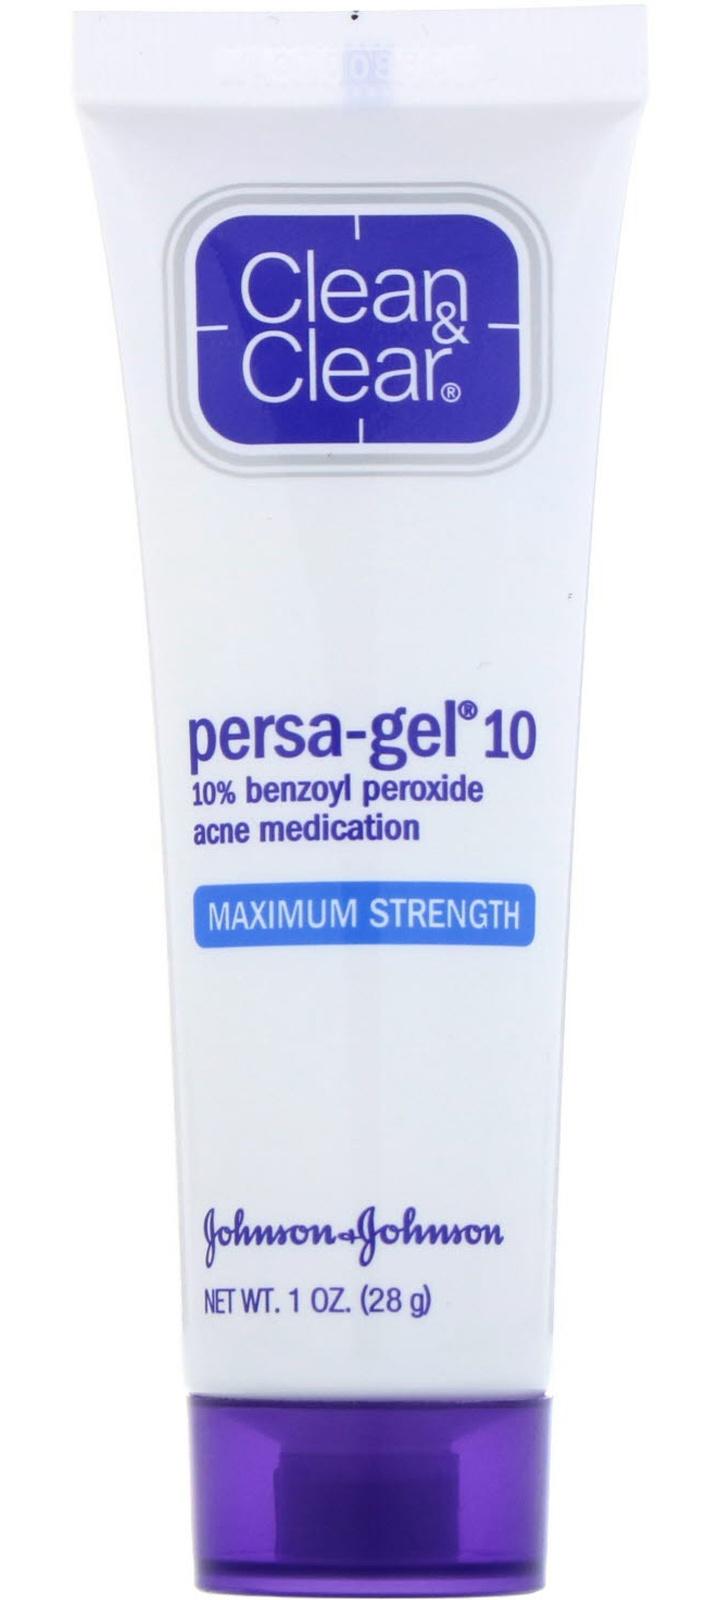 Clean & Clear Persa-Gel 10, Maximum Strength